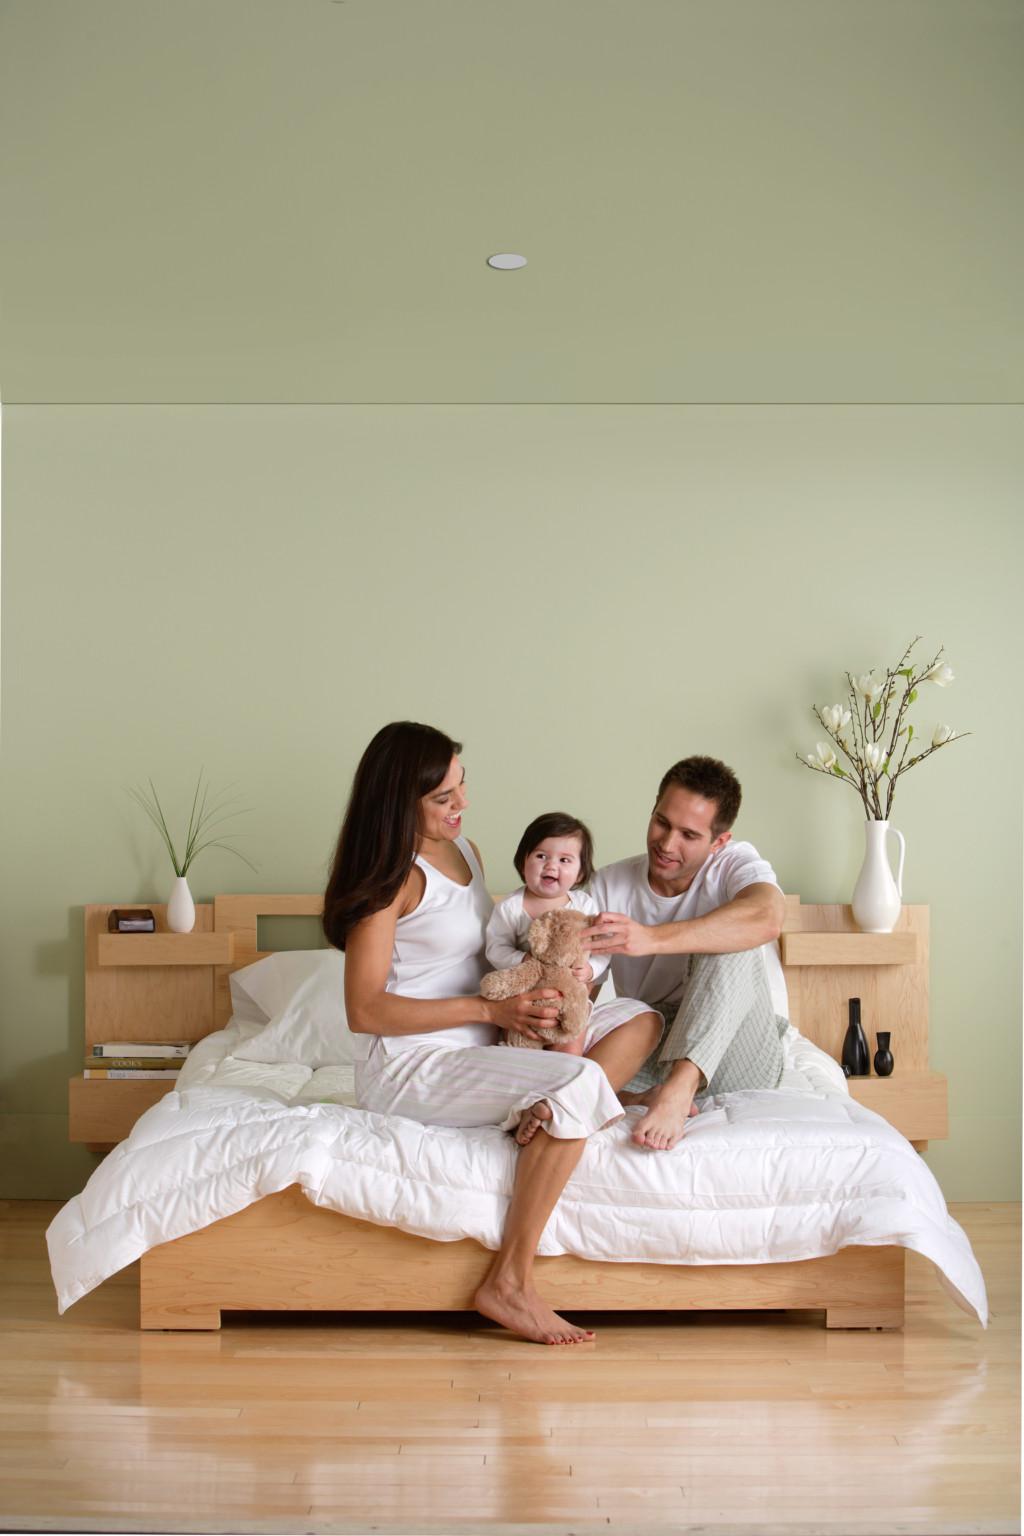 Miami Moms Blog National Home Fire Sprinkler Week :: Is YOUR Home Safe?